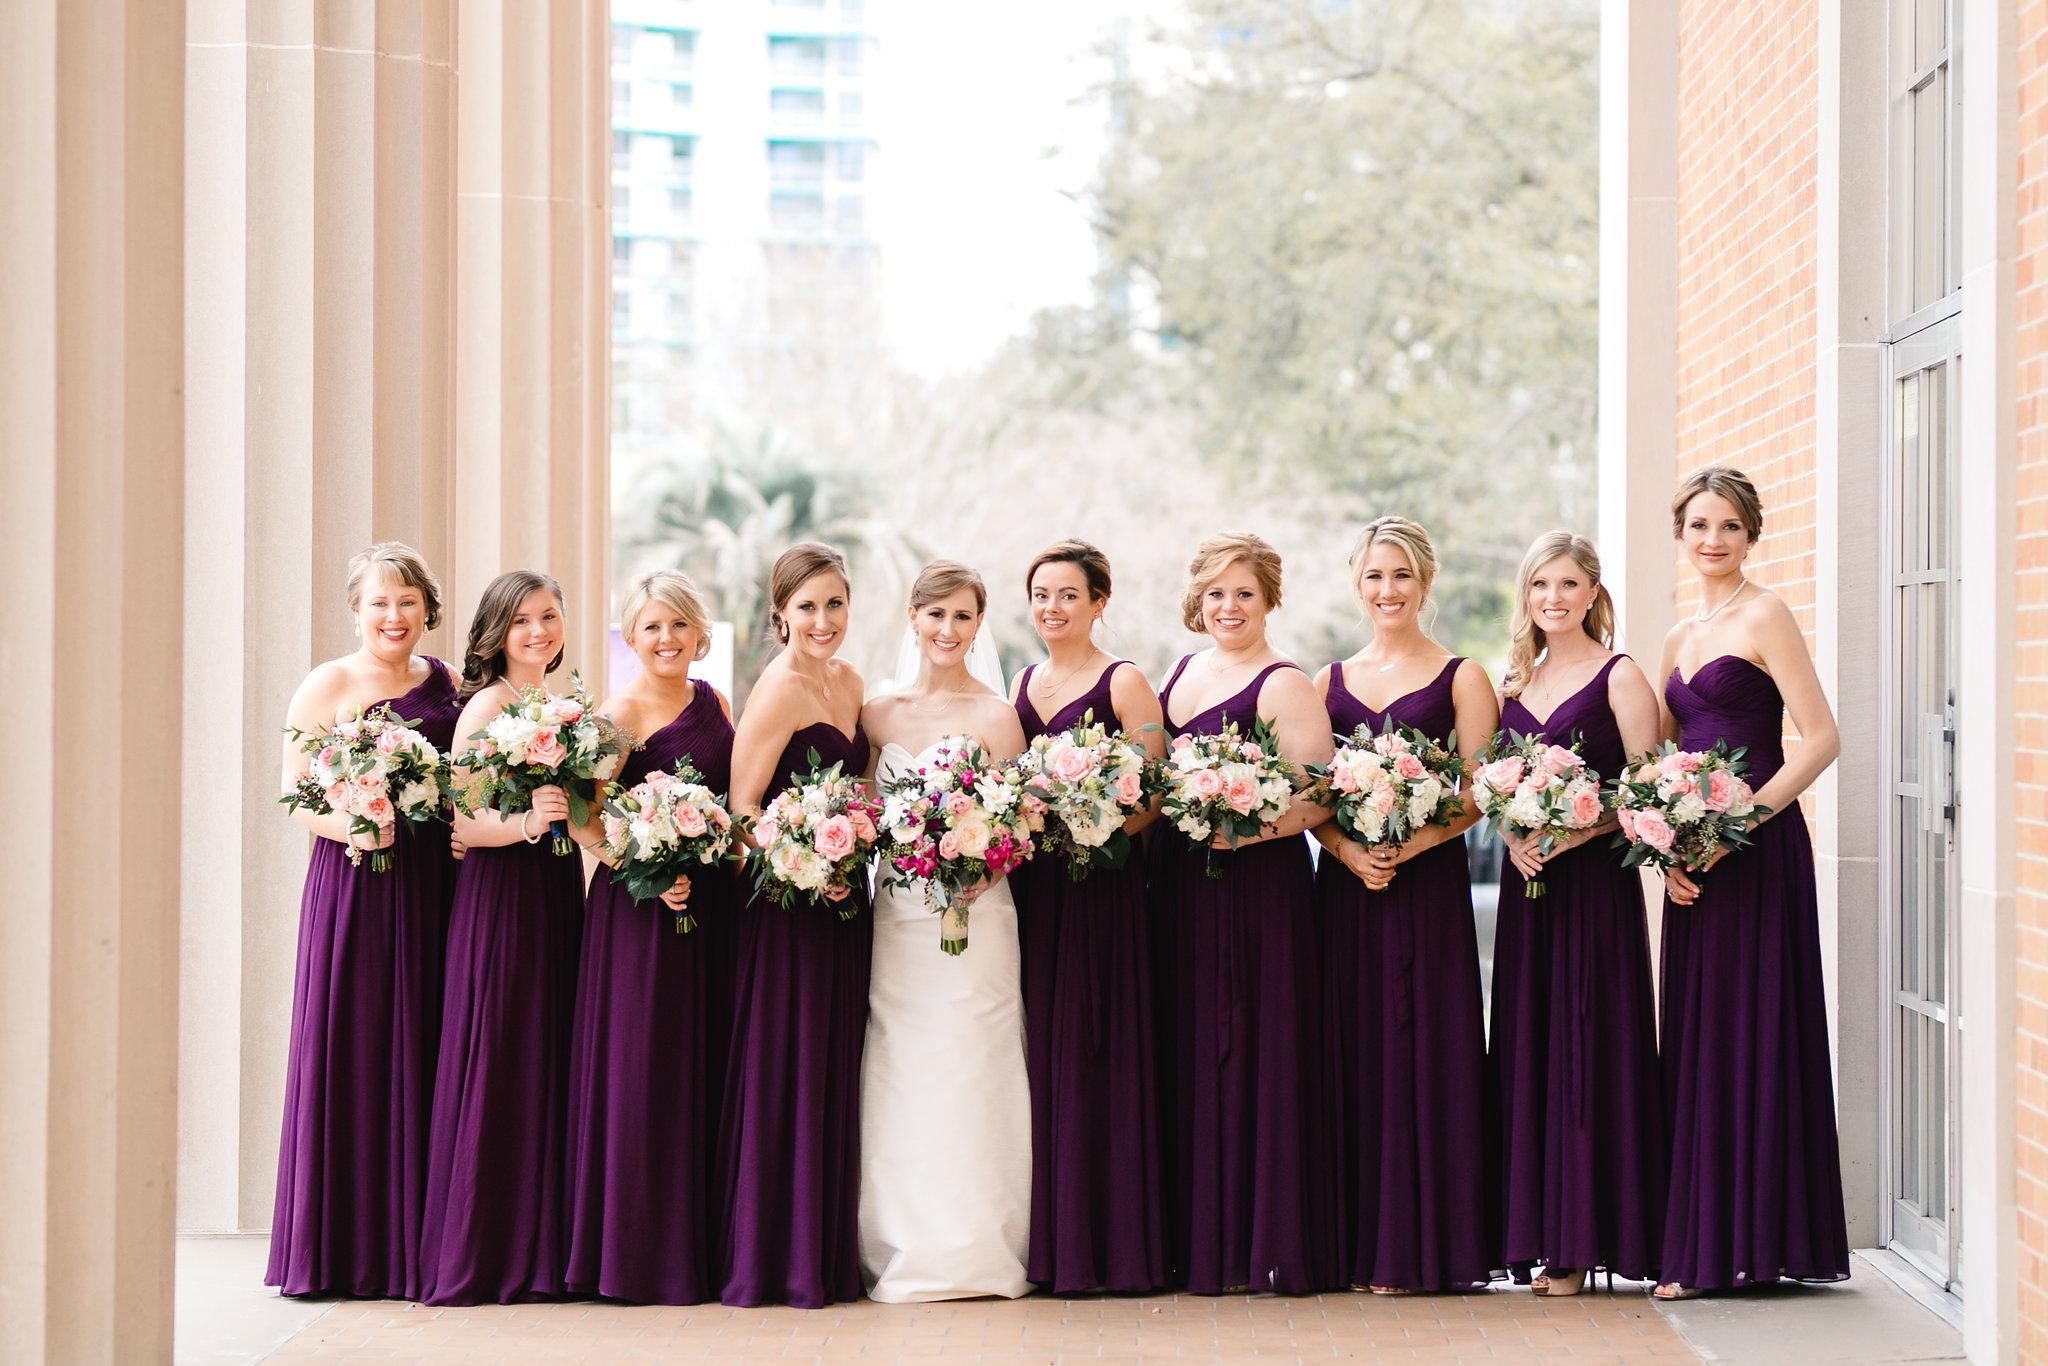 Bride with her bridesmaids in deep plum dresses